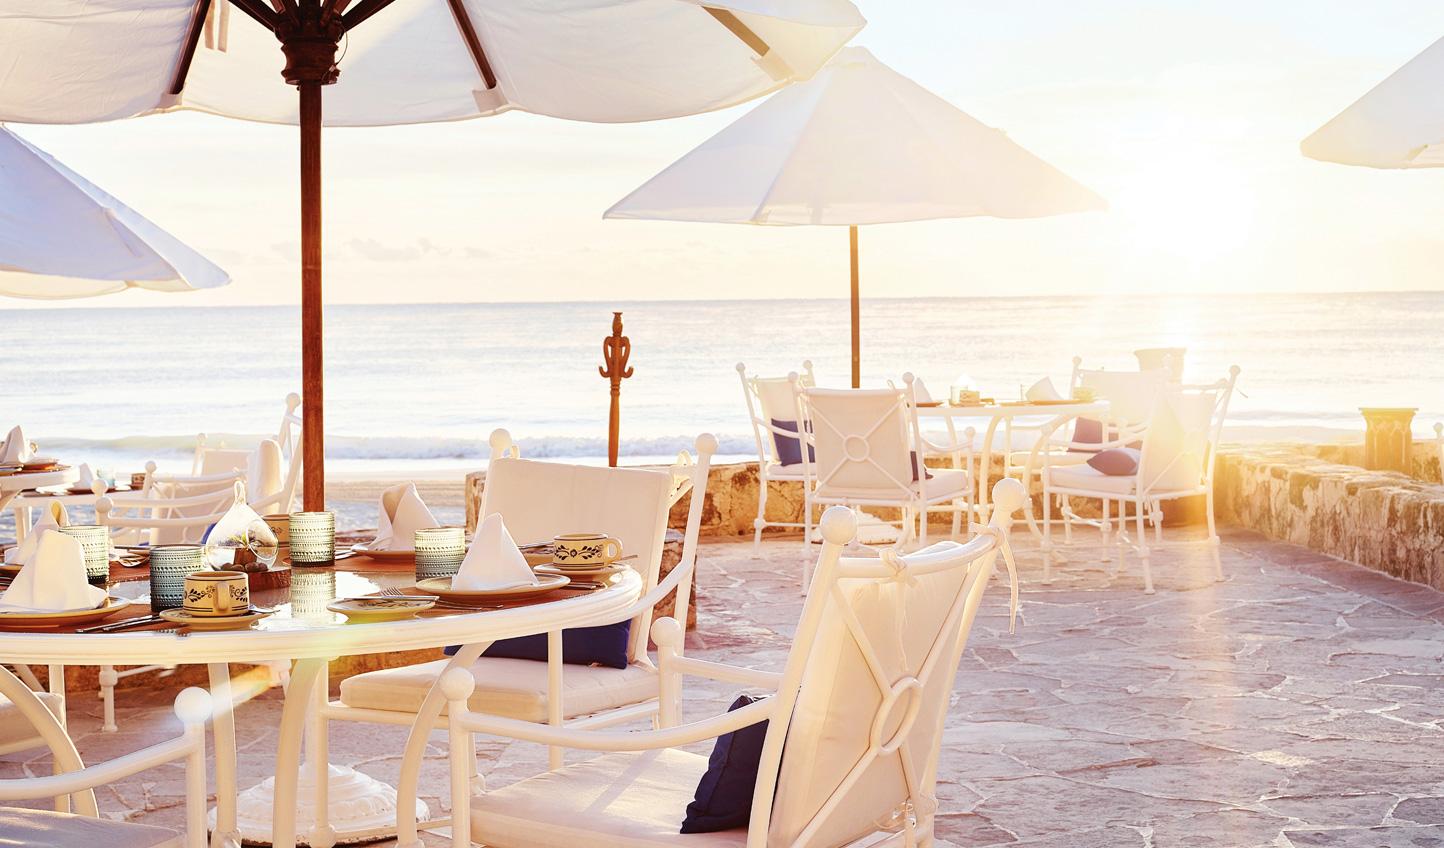 Dine beachside at Belmond Maroma